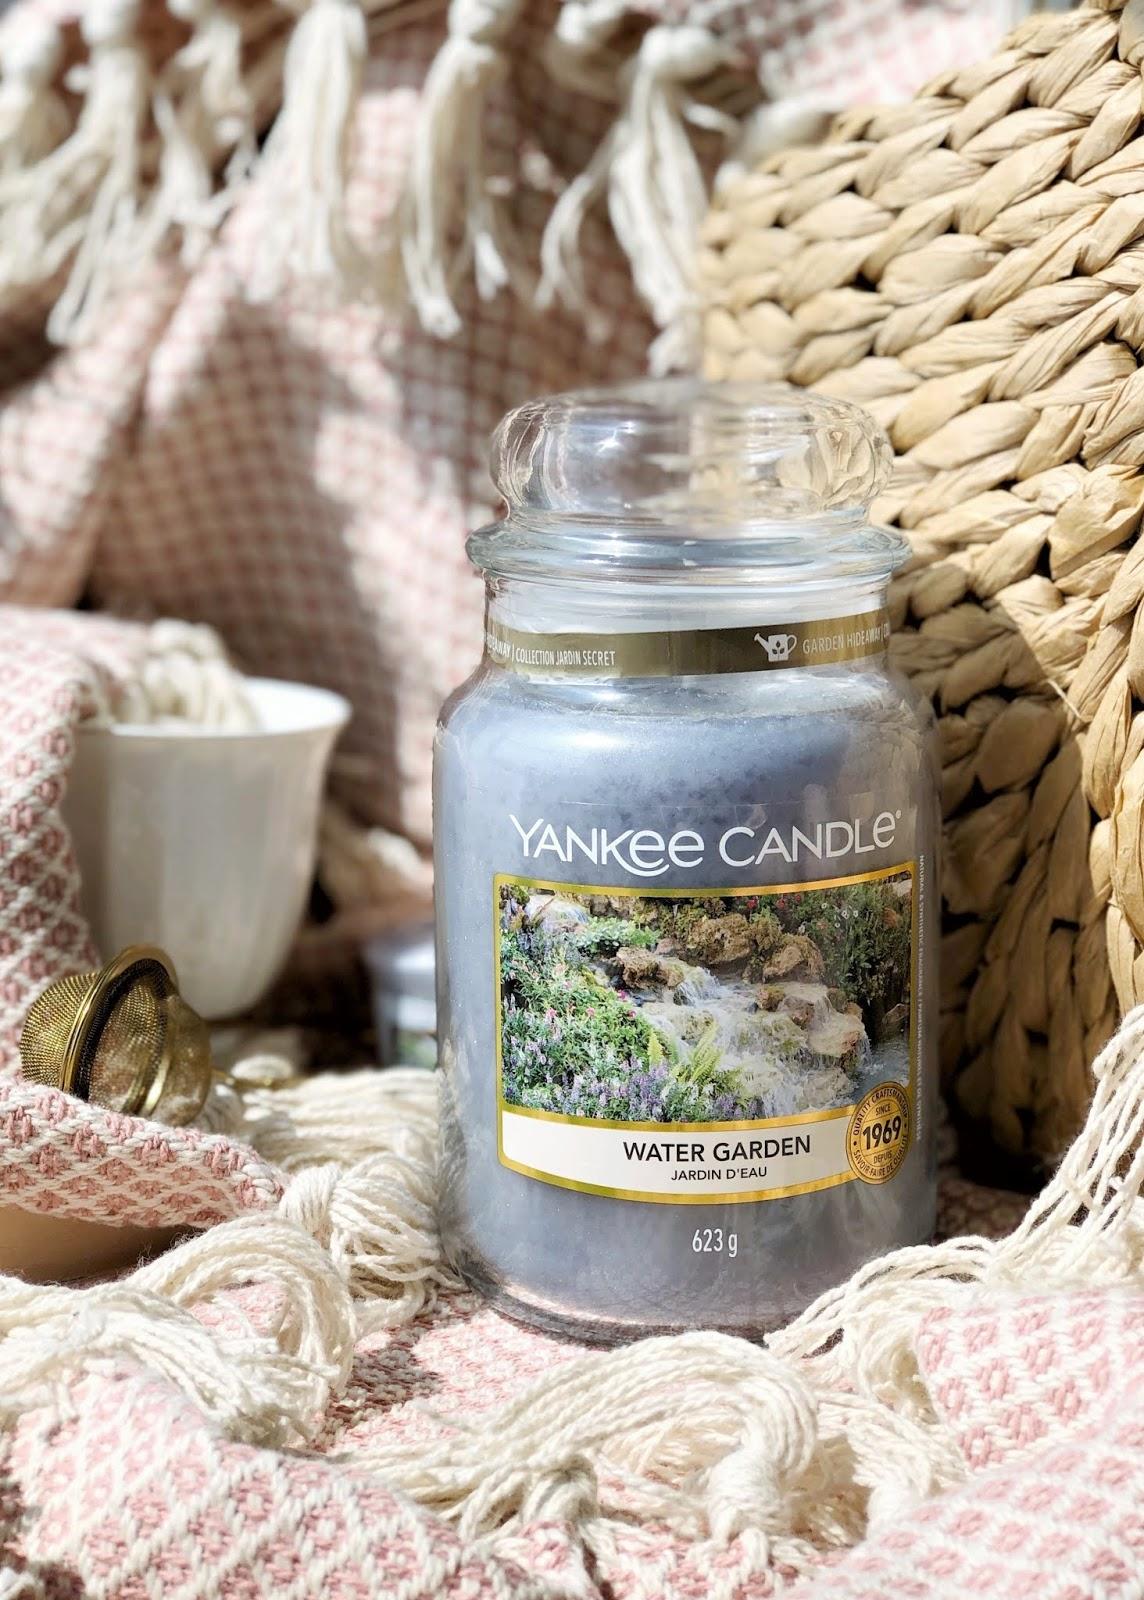 Hideaway-Garden-Summer-Yankee-Candle-Water-Garden